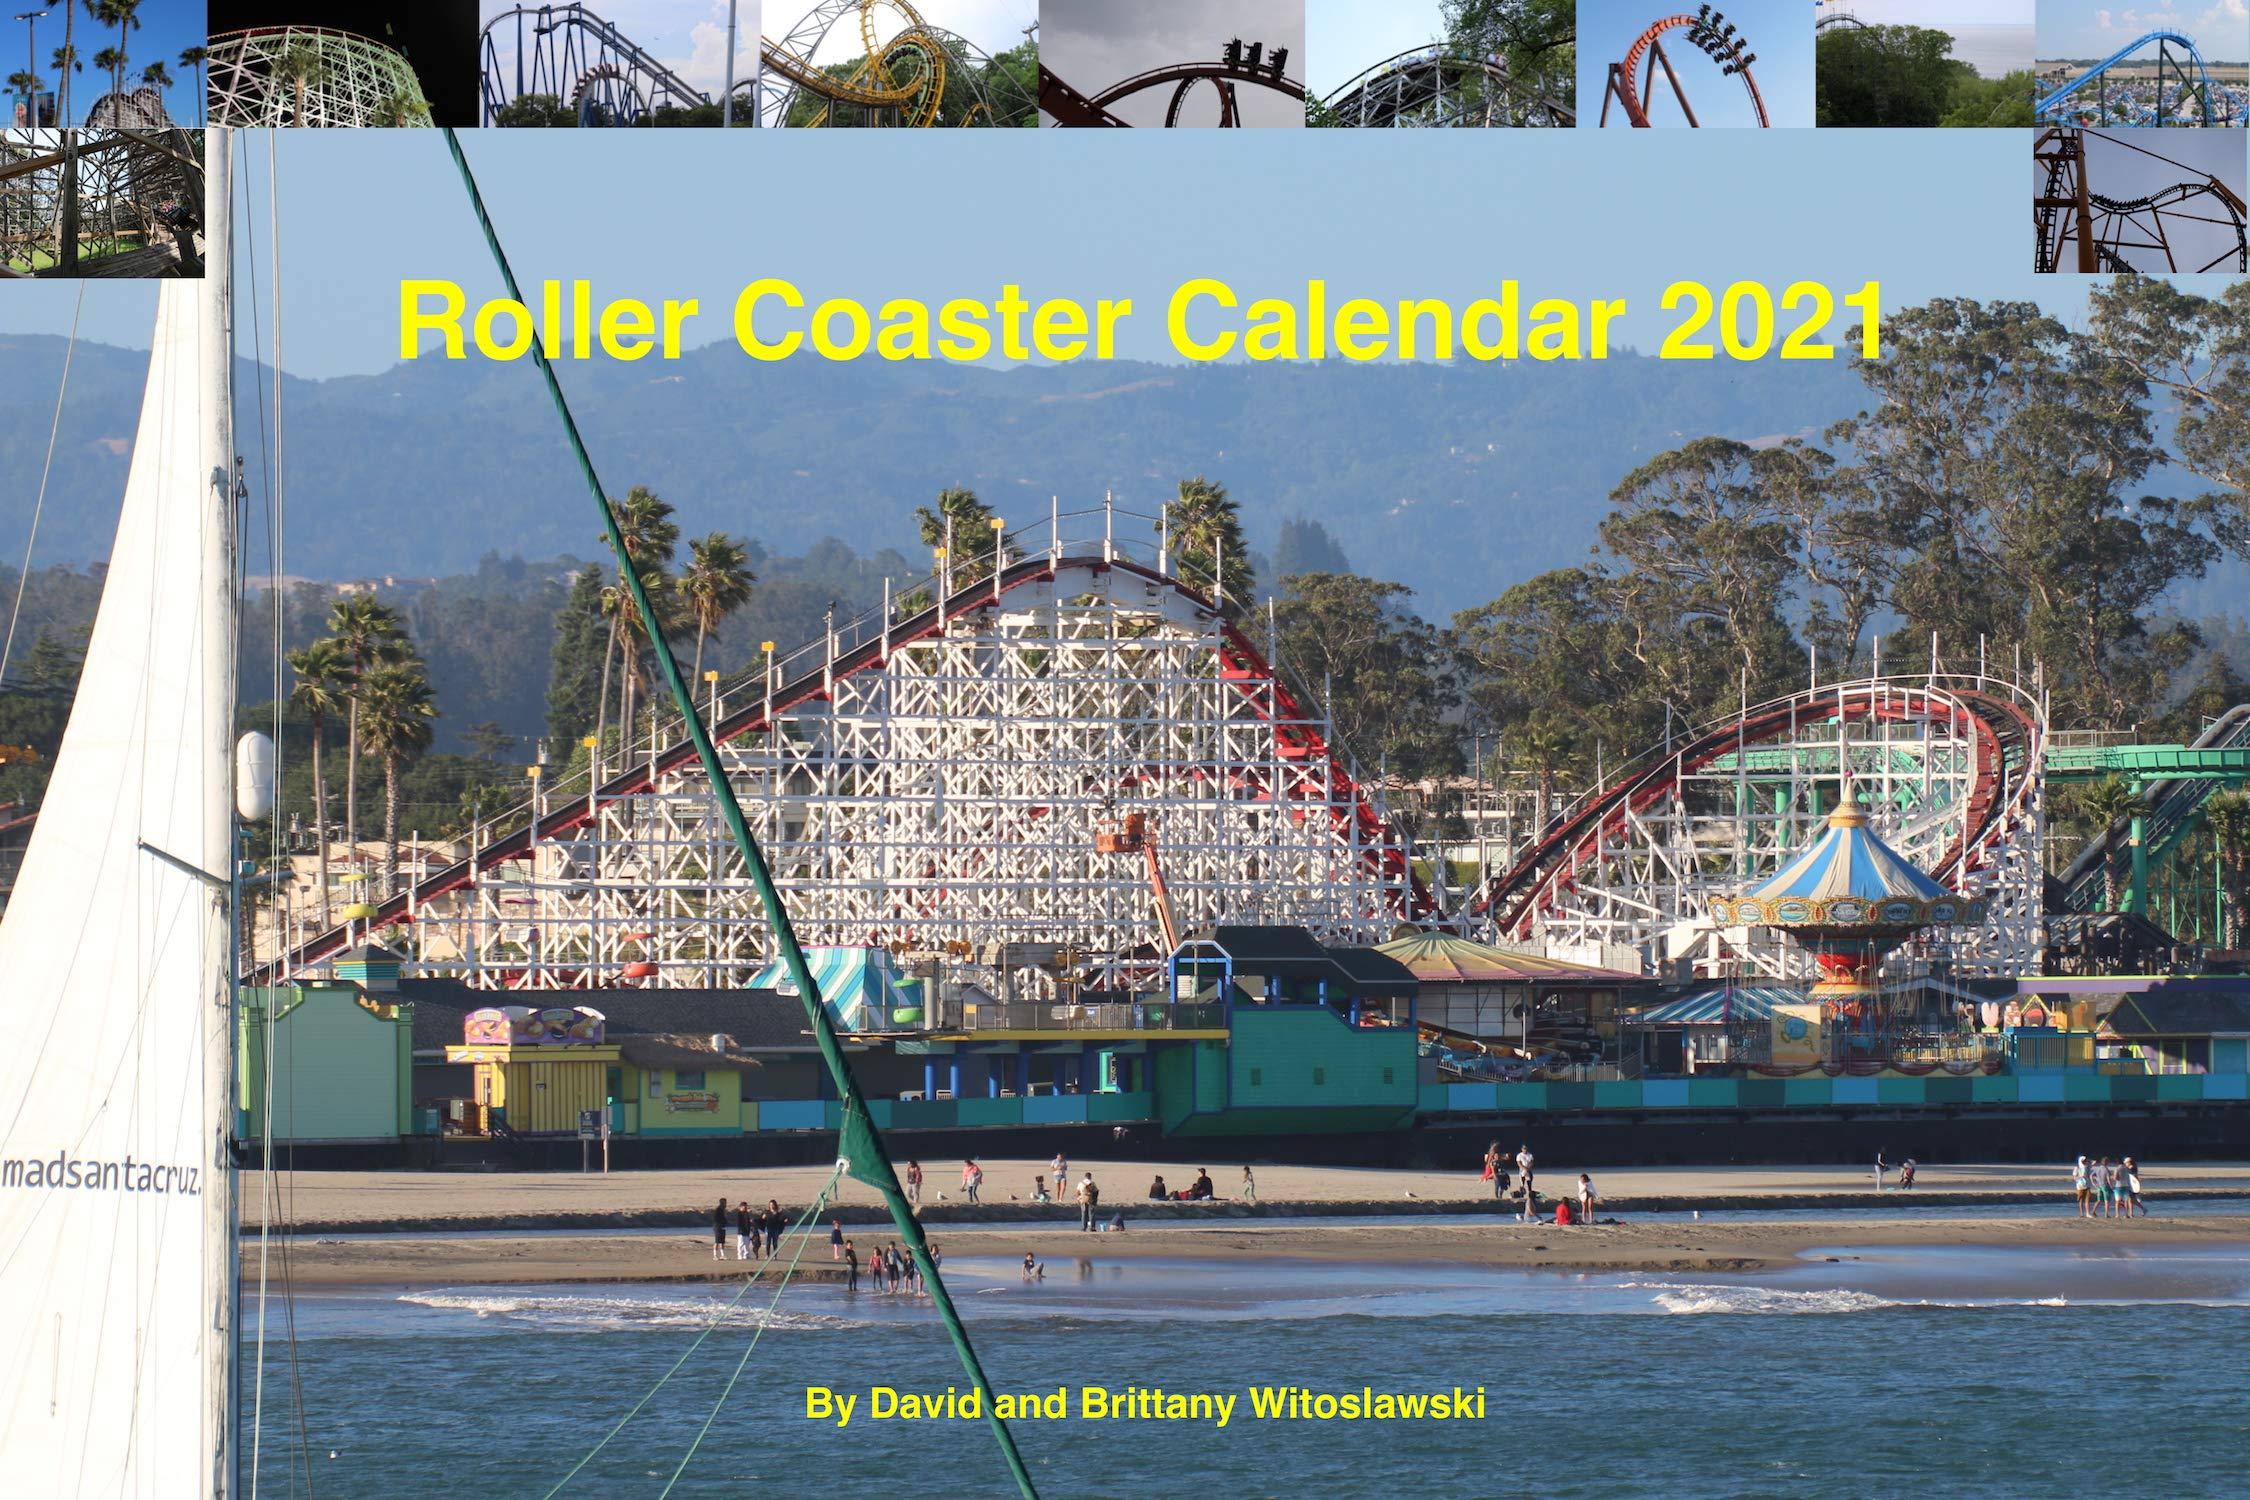 Kennywood Calendar 2021 2021 Roller Coaster Calendar: David Witoslawski, Brittany